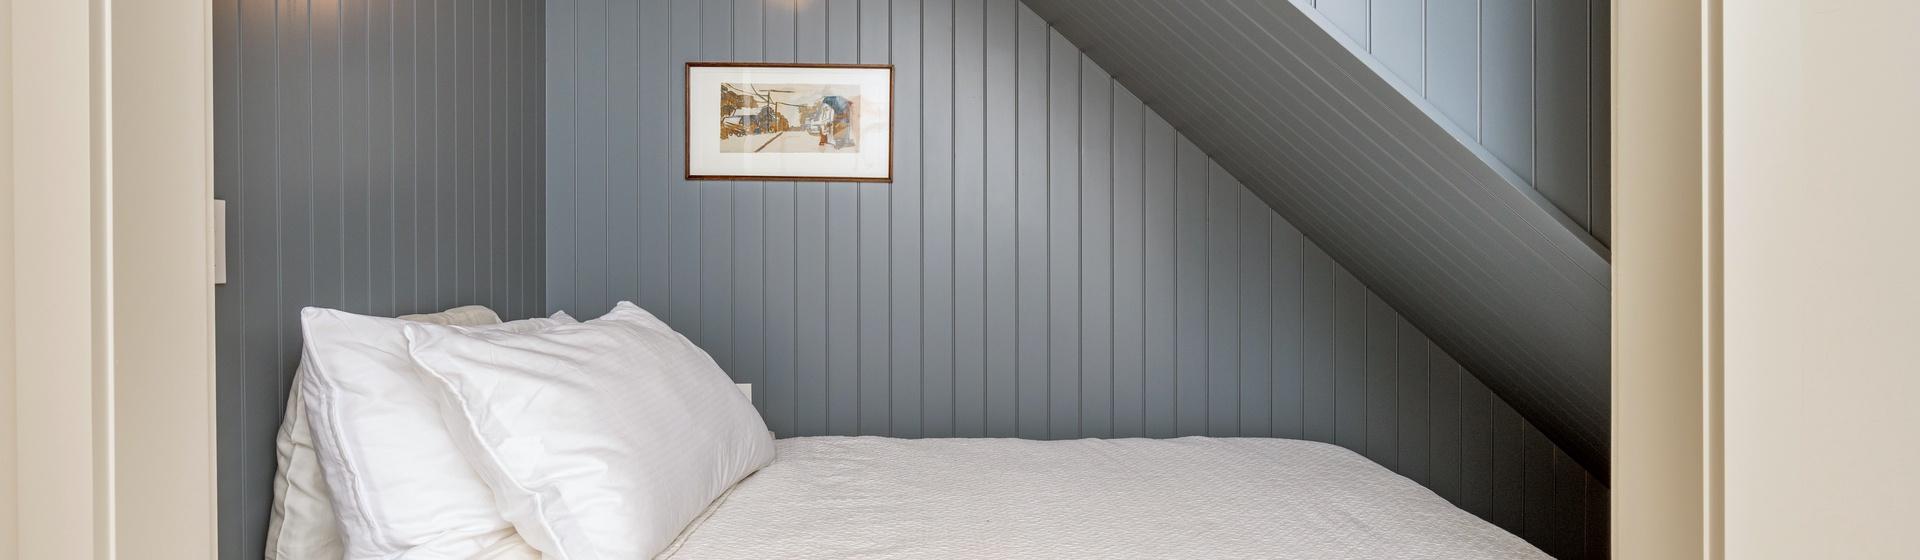 41-Telluride-Vacation-Rental-Cloud-Nine-Cottage-Cubby